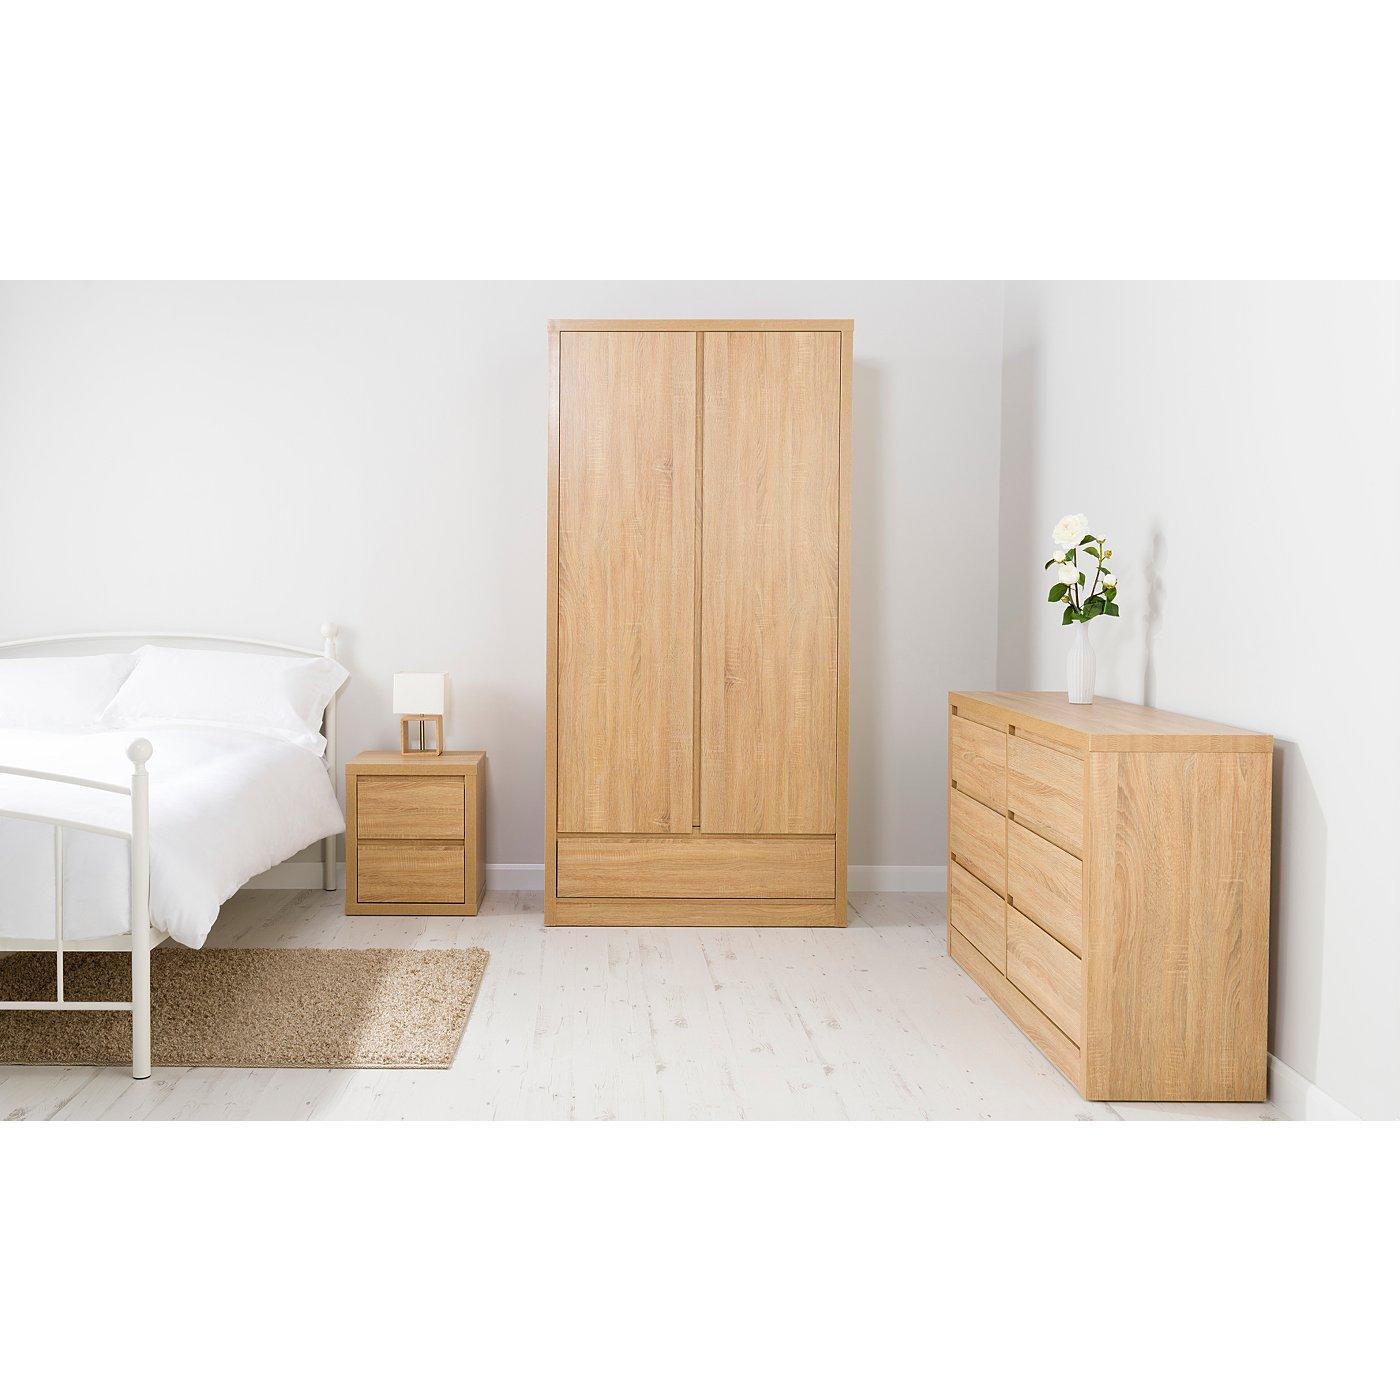 Oak Bedroom Furniture Uk George Home Leighton Bedroom Furniture Range Oak Effect